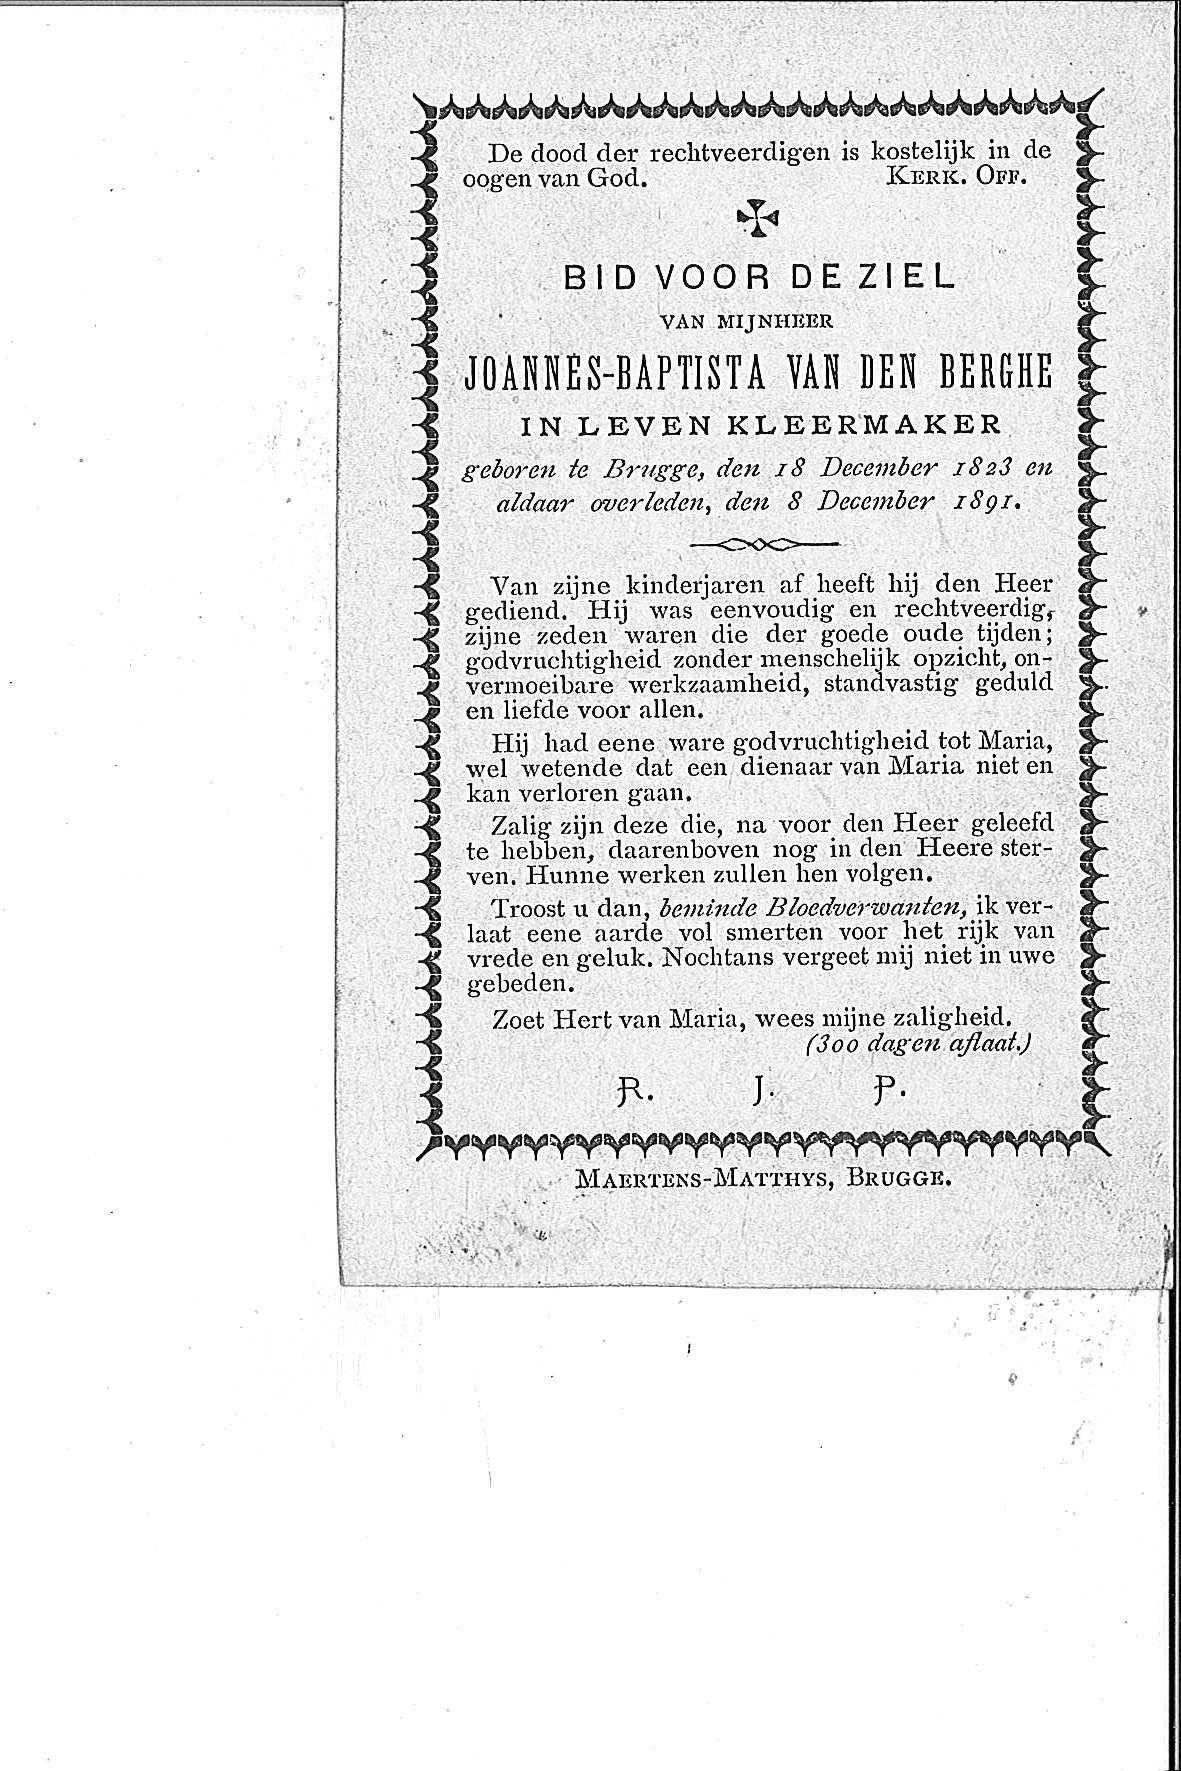 Joannes_Baptista(1891)20150805160844_00047.jpg